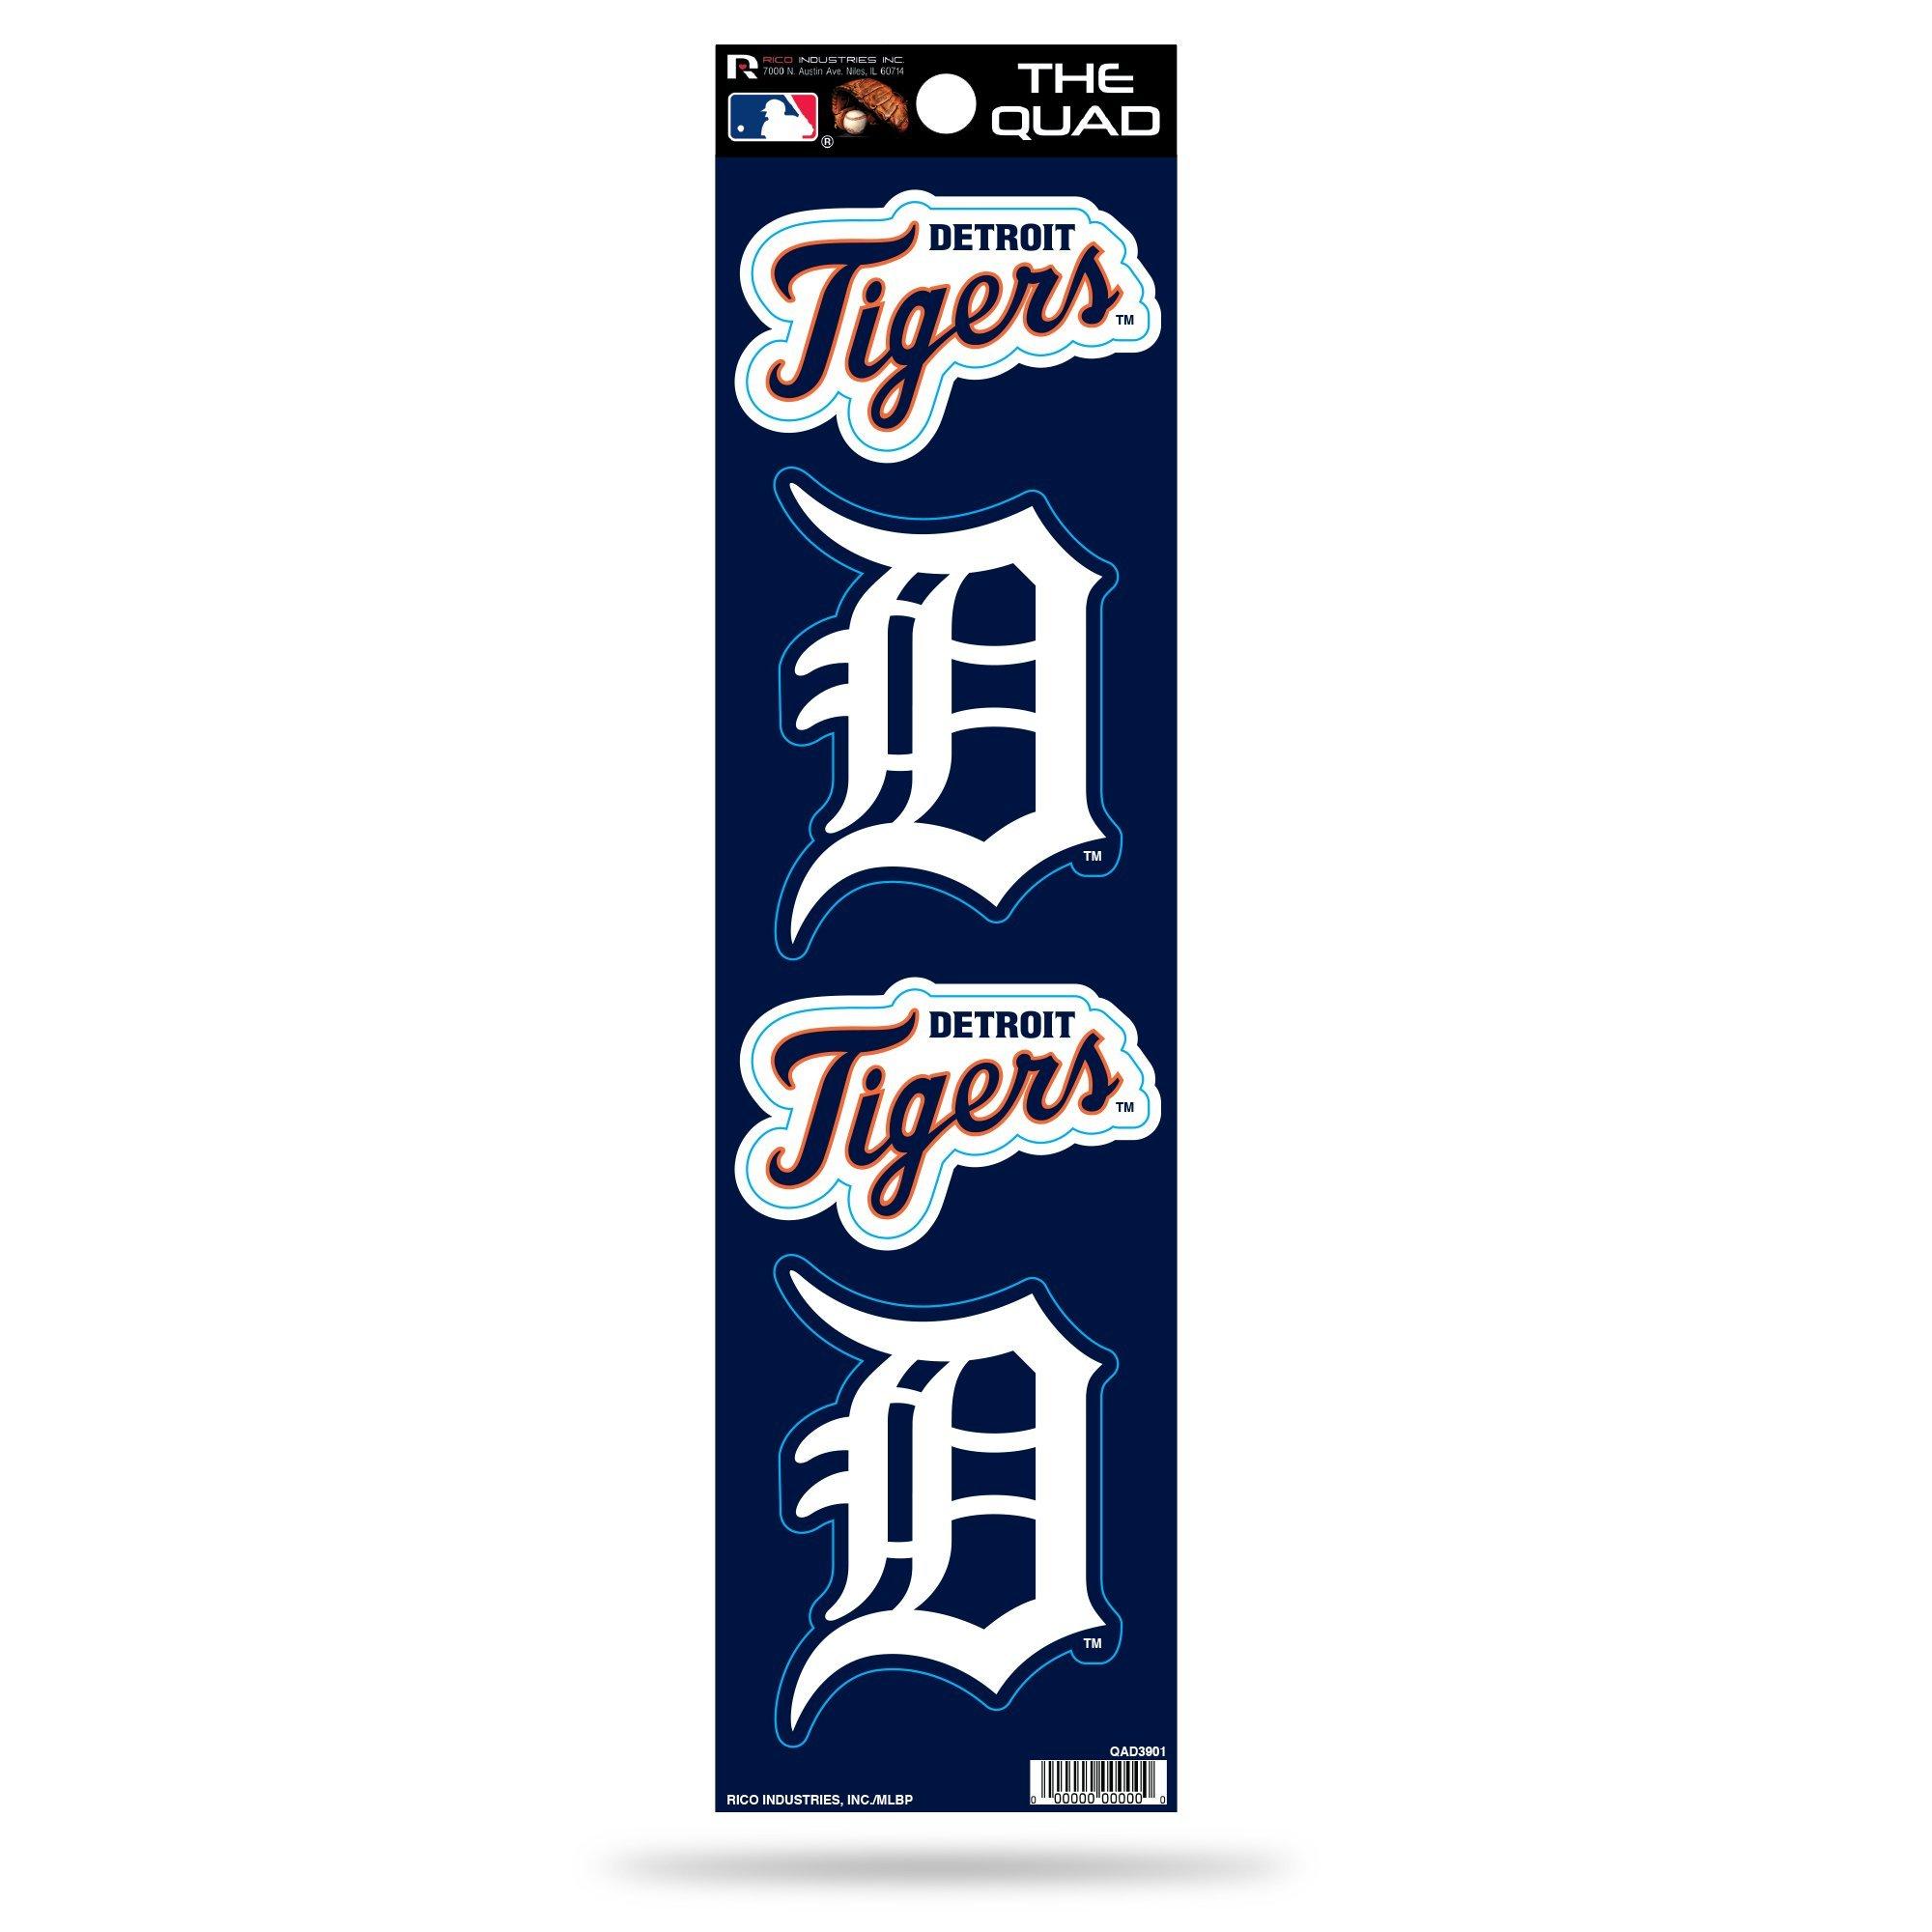 MLB Detroit Tigers Quad Decal